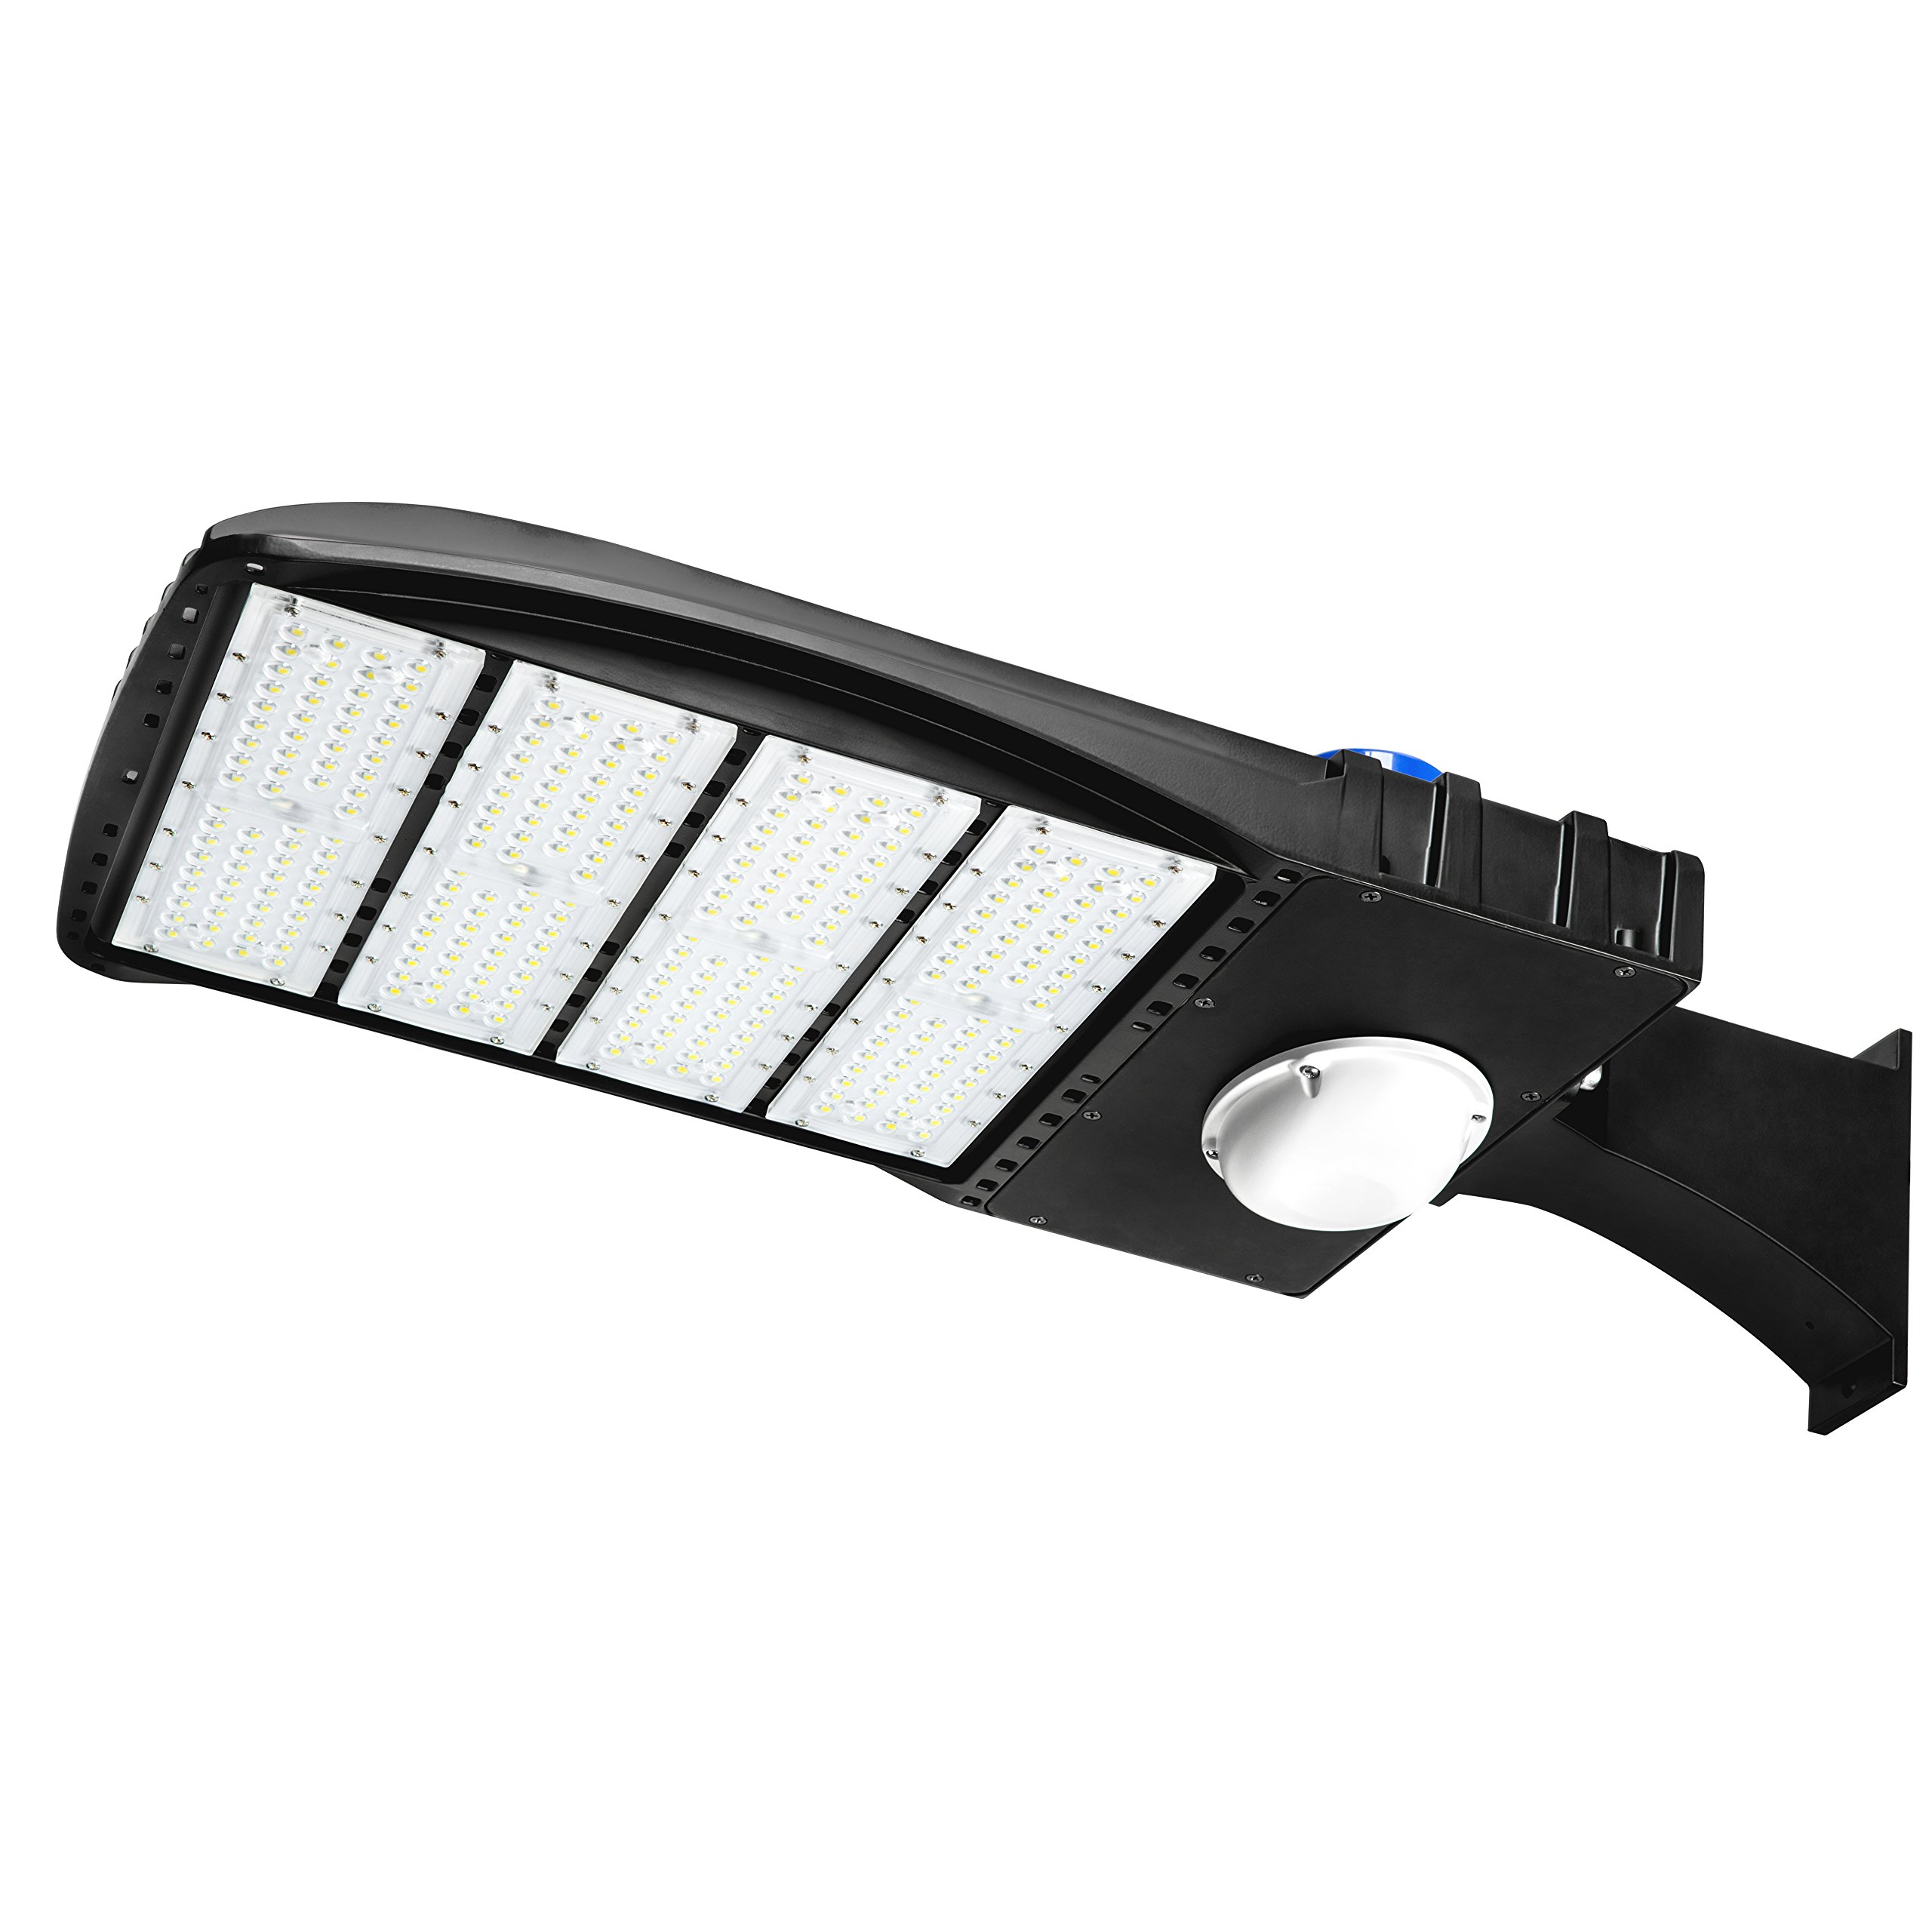 Hyperikon LED Shoebox Pole Light with Motion Sensor, 240W (HID/HPS Replacement) 5700K, 33000 Lumens, Photocell Street and Area Parking Lot Lights, UL, IP65 Waterproof